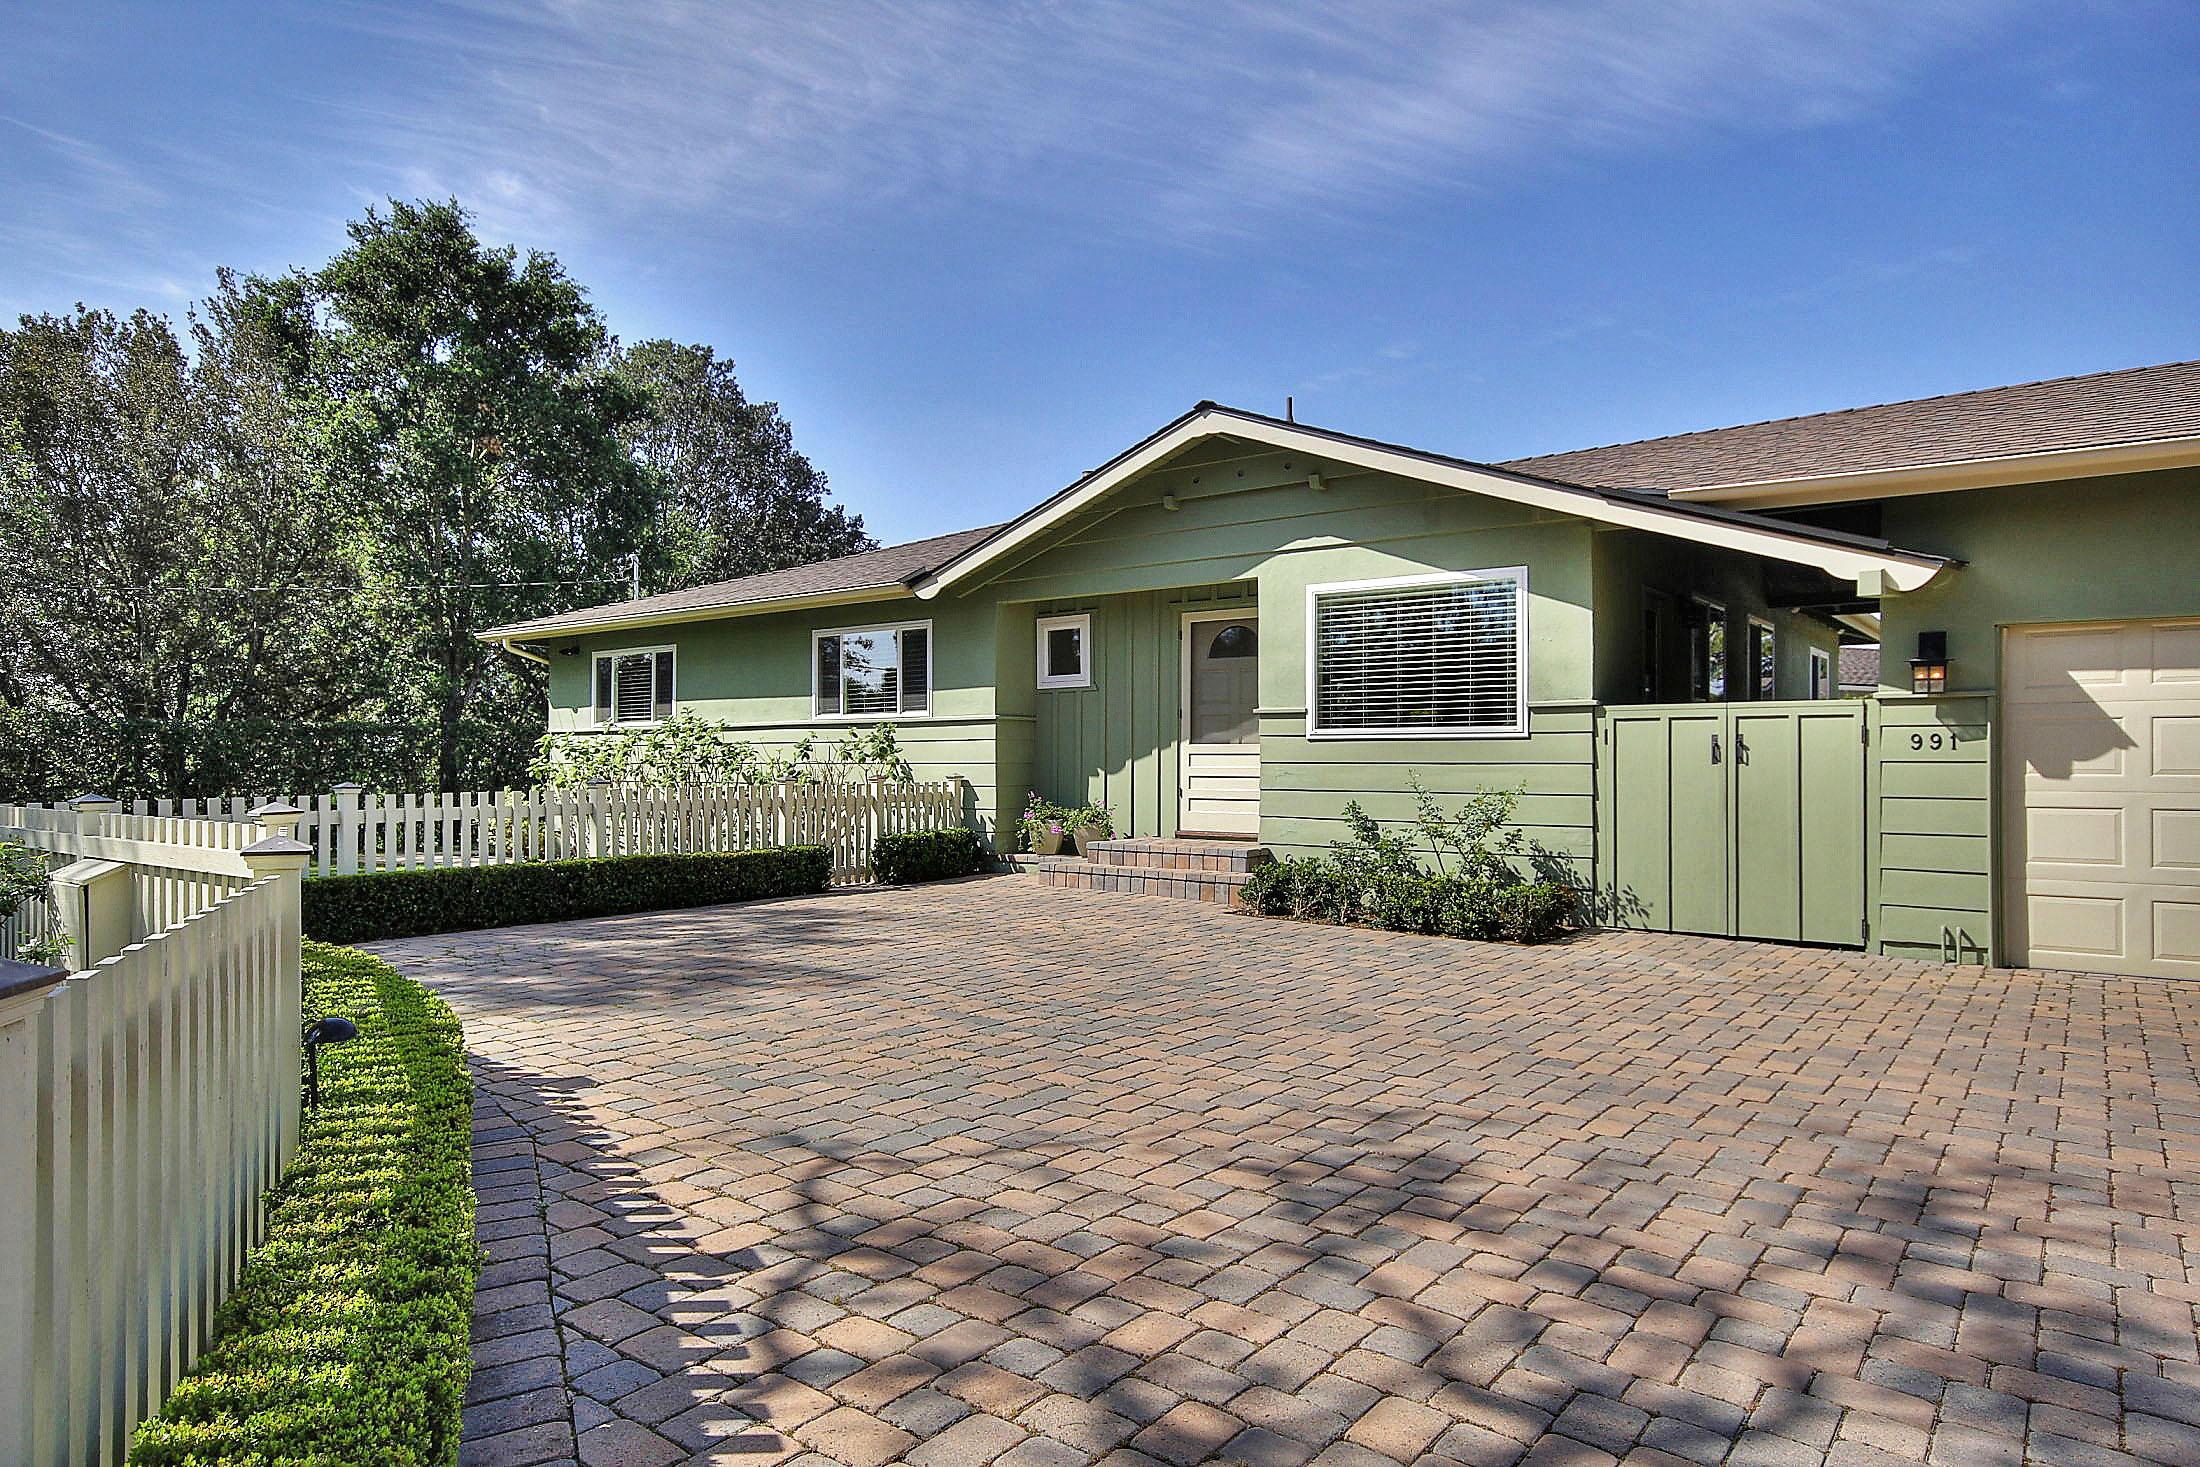 Property photo for 991 Winther Way Santa Barbara, California 93110 - 15-1105